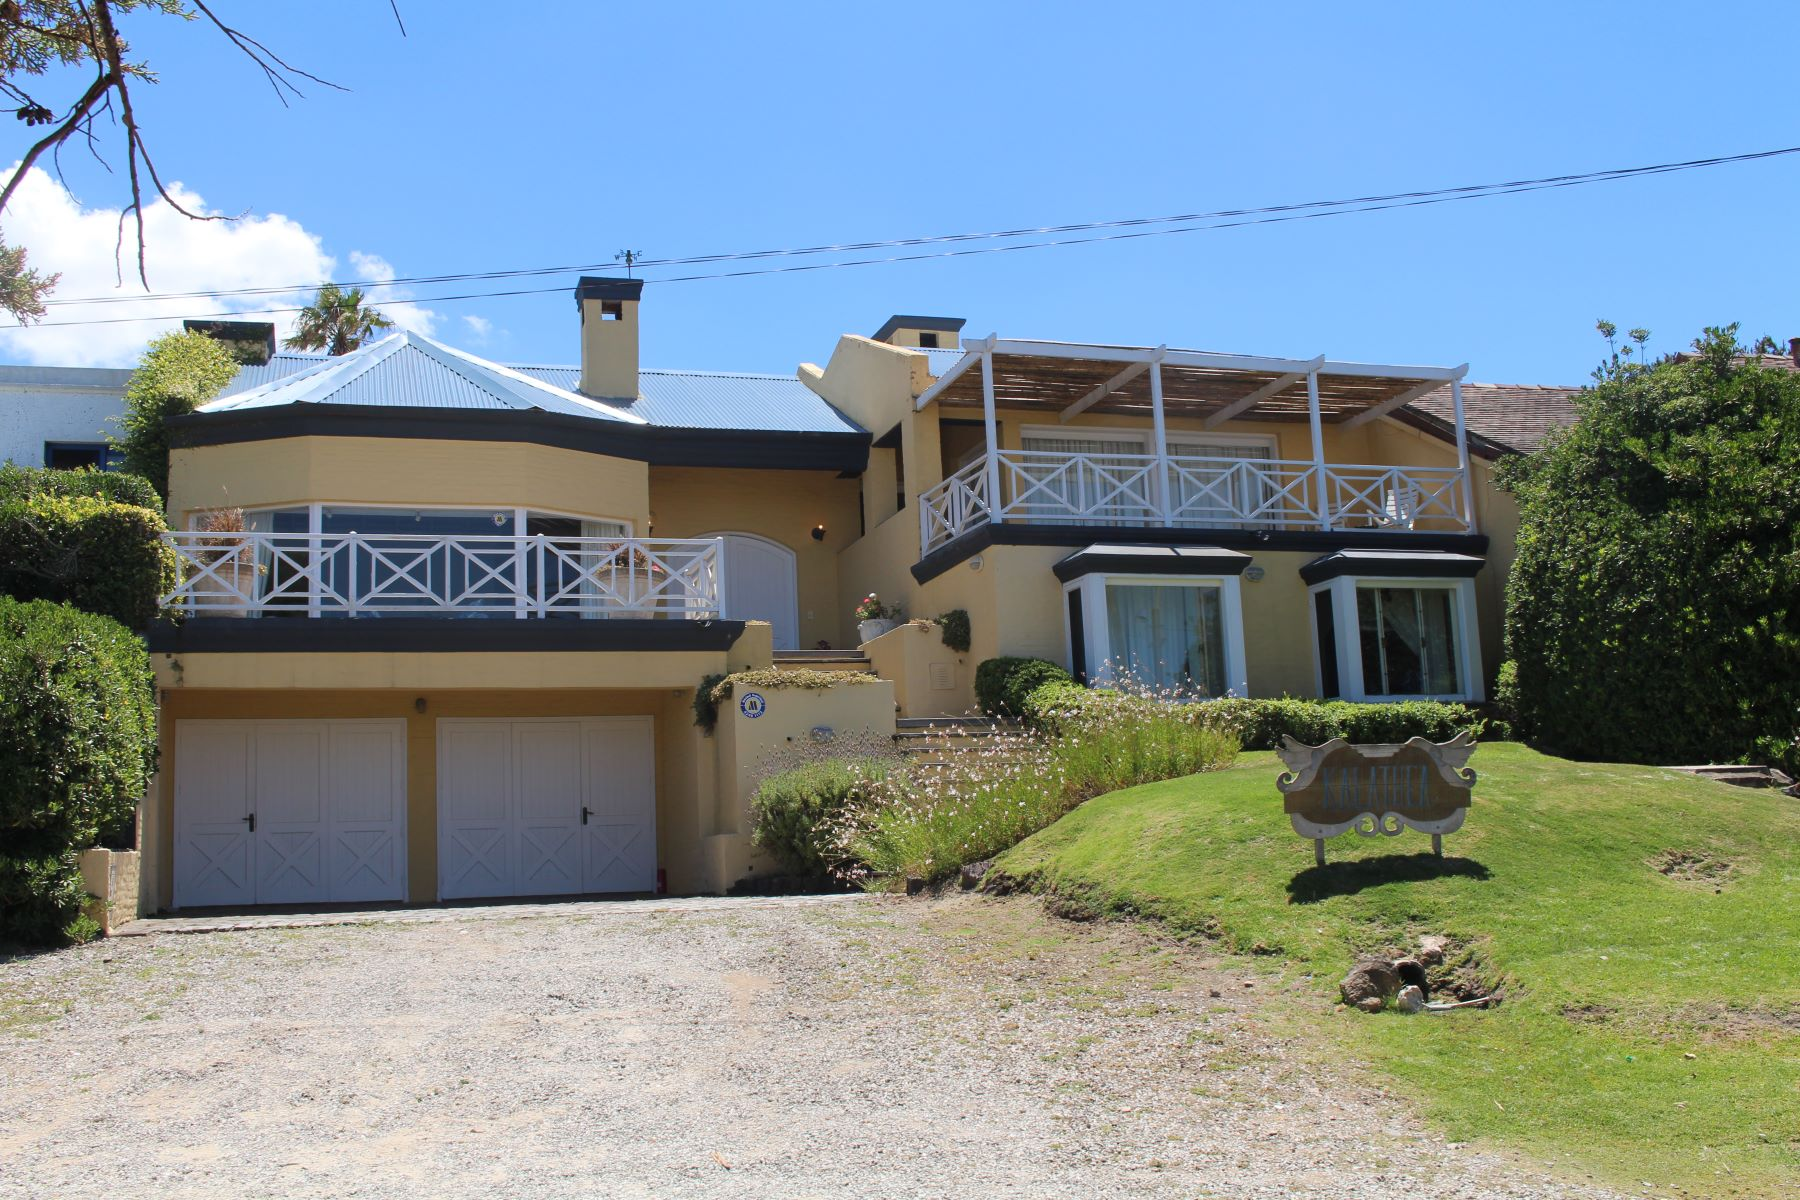 Single Family Home for Sale at Kalathea La Barra, Maldonado, Uruguay